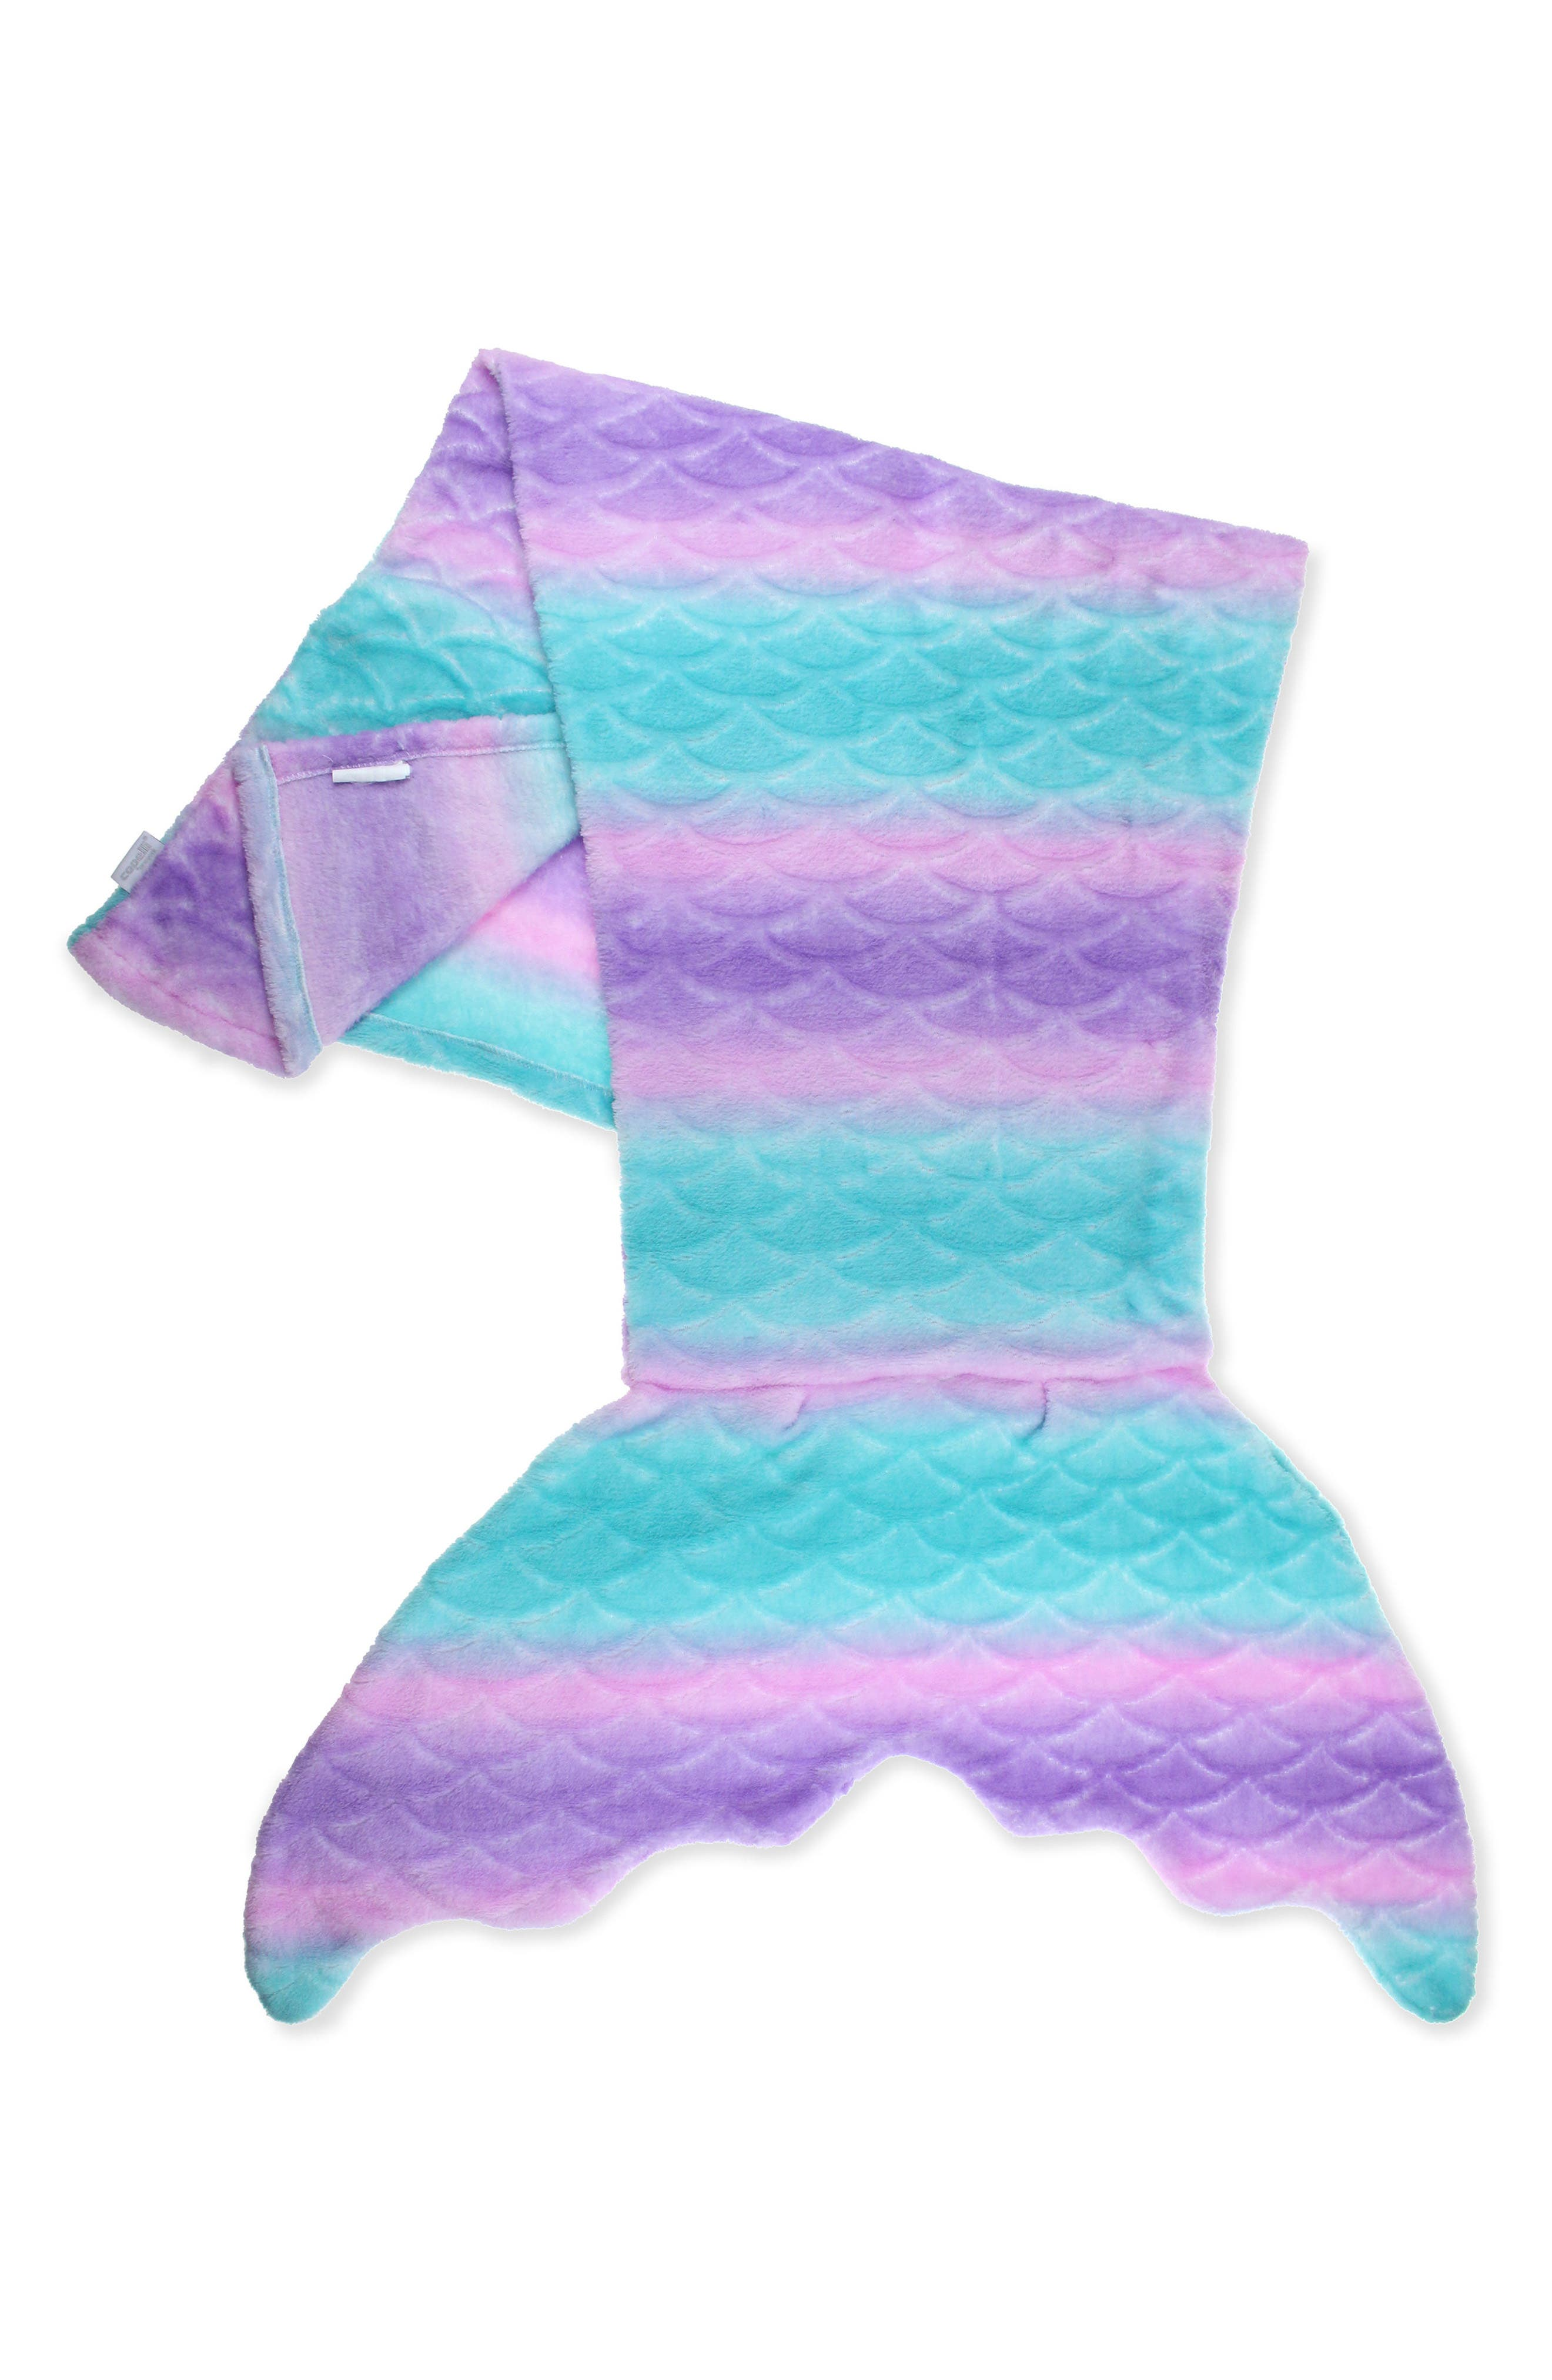 Capelli New York Sculpted Ombré Mermaid Tail Blanket